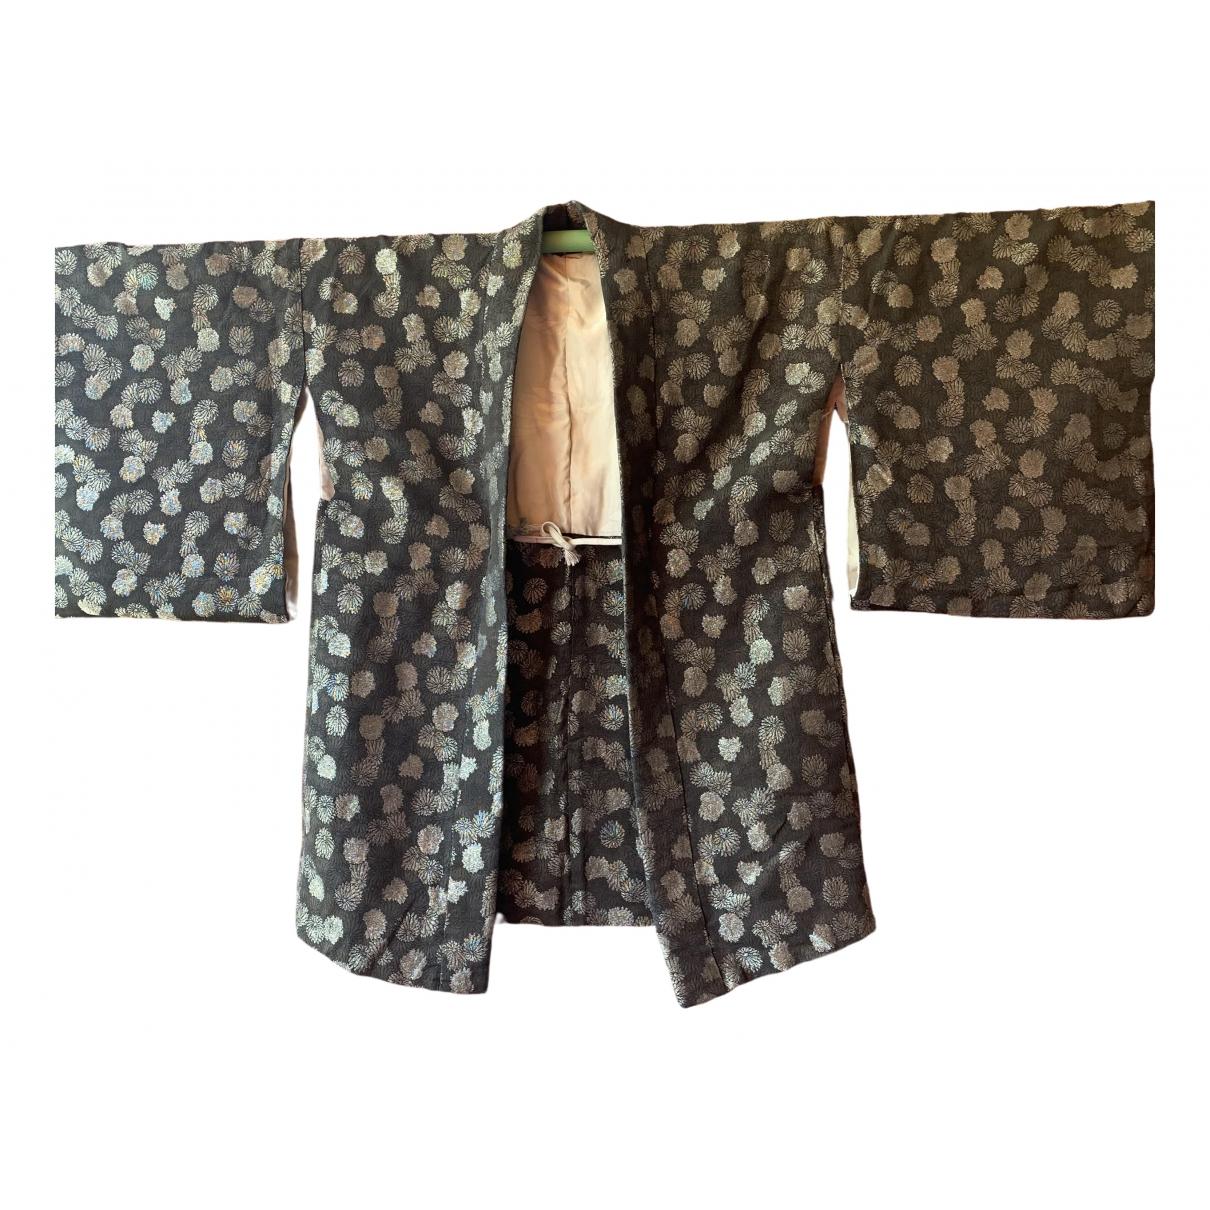 & Stories \N Silk jacket for Women One Size International